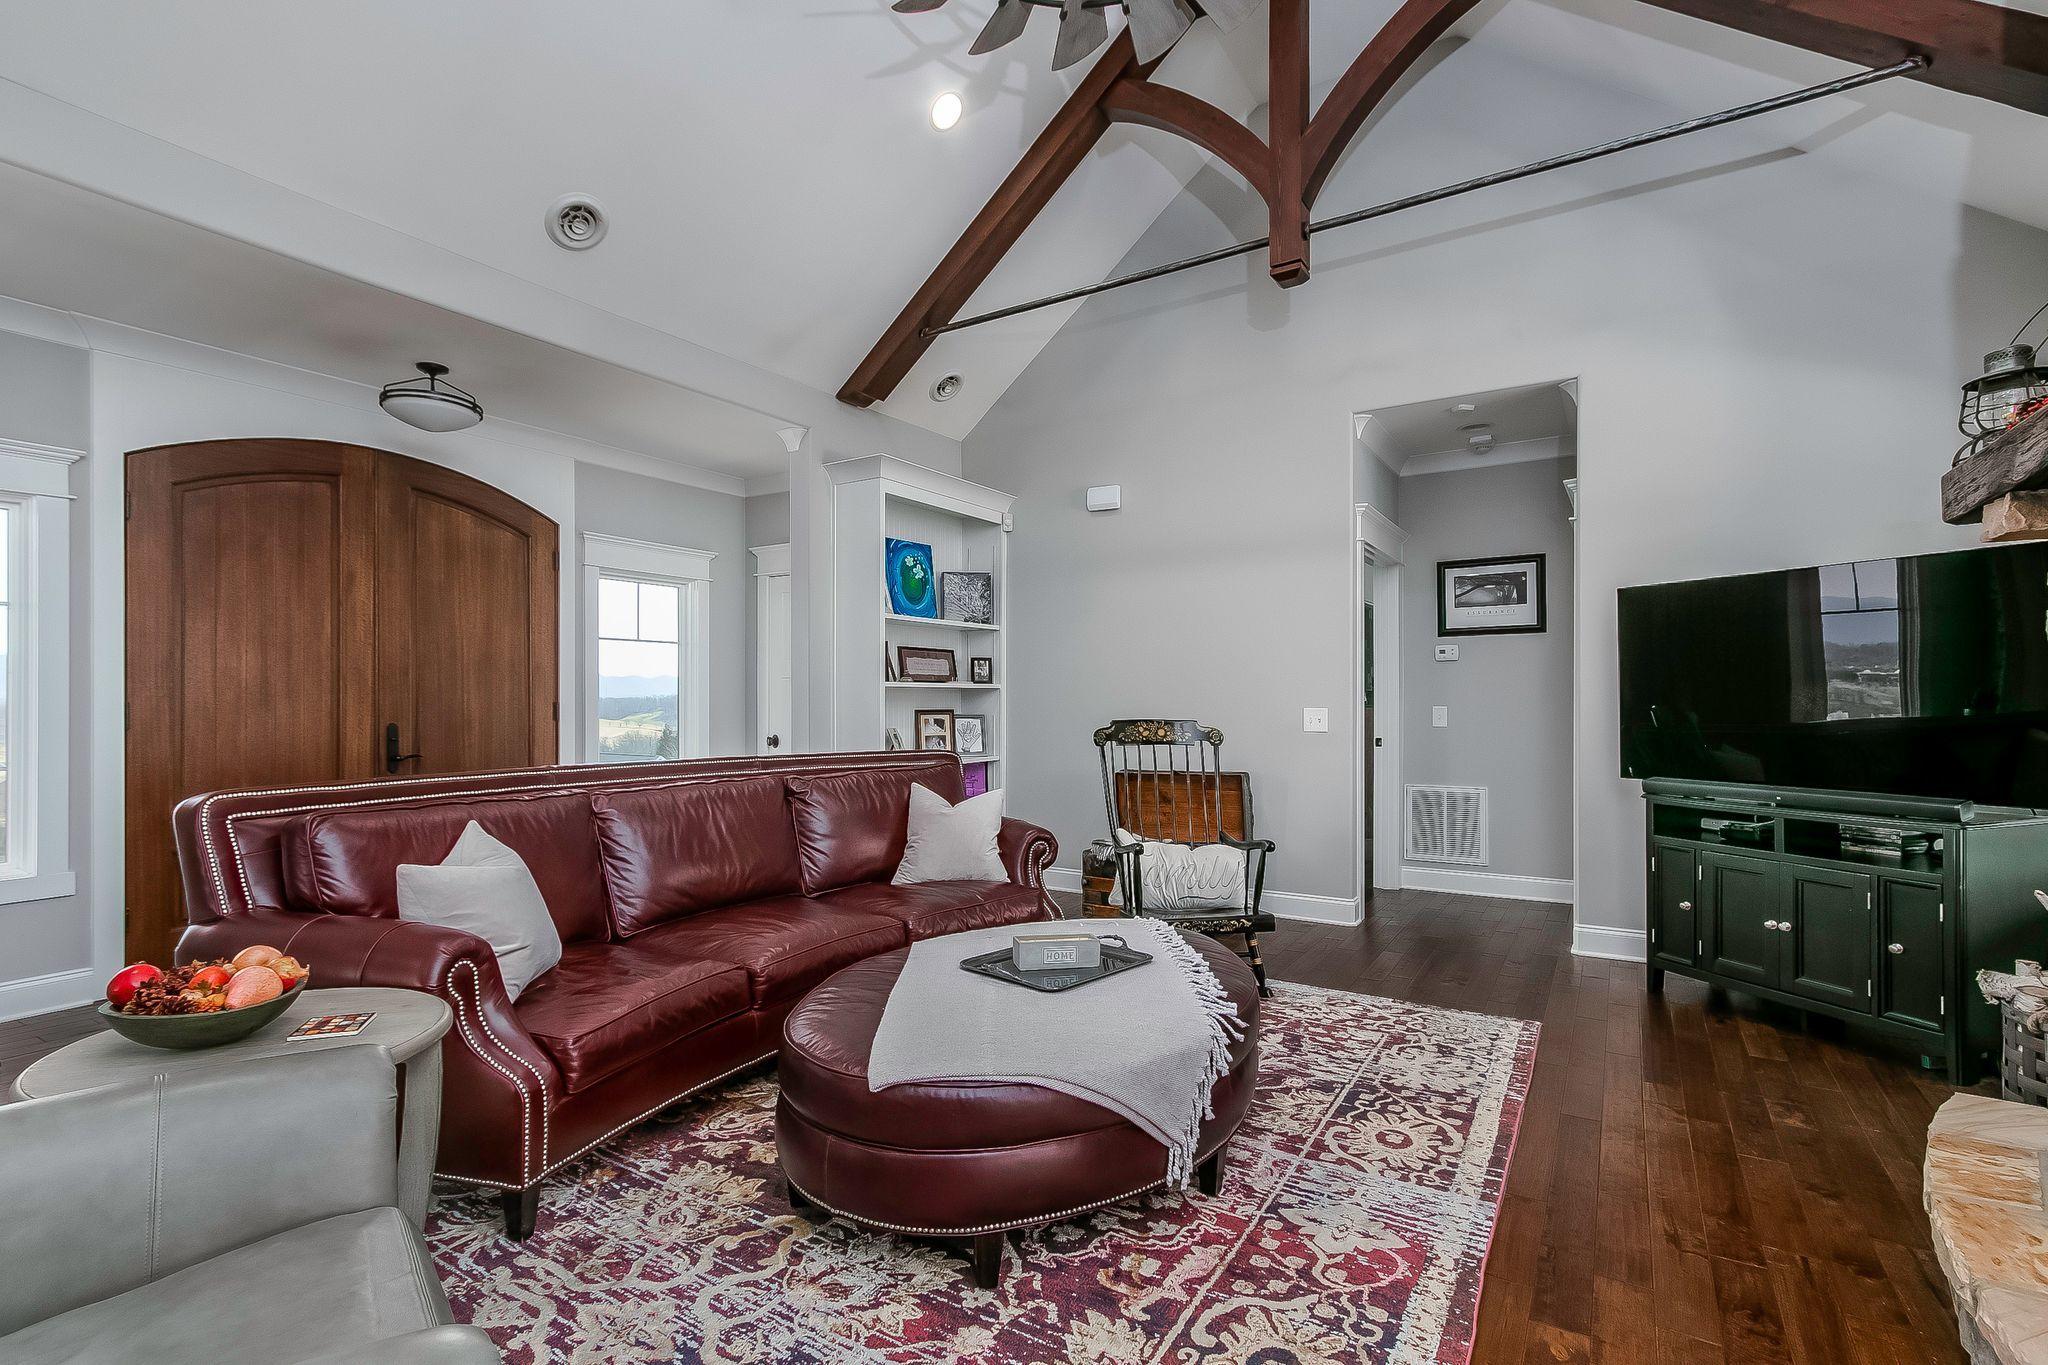 126 Simmons Ridge, Johnson City, Tennessee 37604, 4 Bedrooms Bedrooms, ,3 BathroomsBathrooms,Single Family,For Sale,126 Simmons Ridge,1,9918867